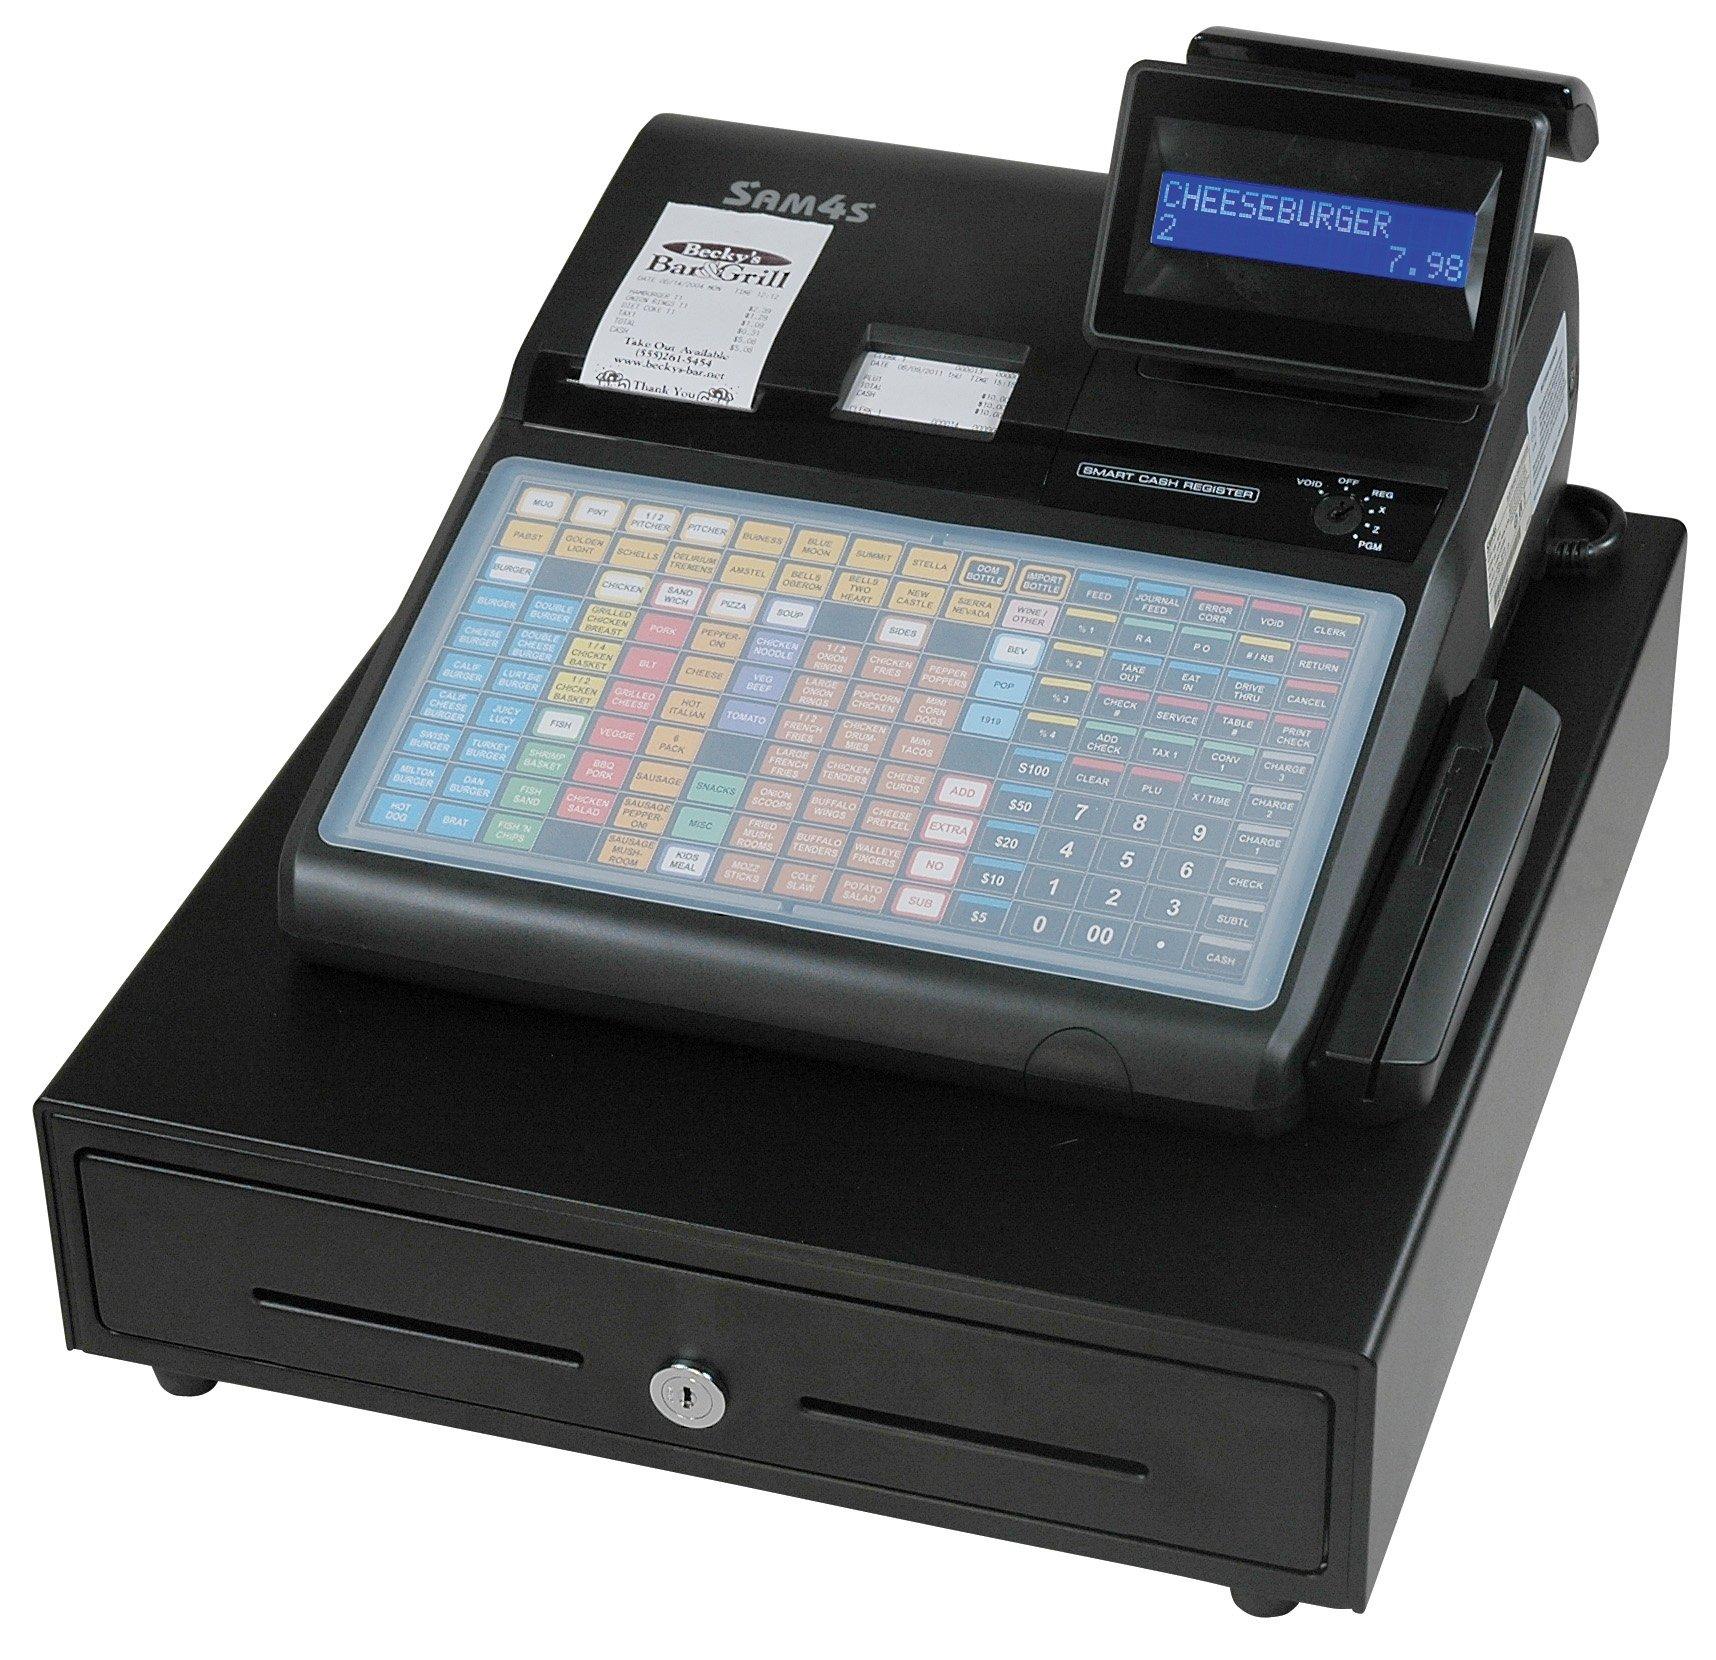 SAM4s ER-940 Cash Register with flat keyboard, with receipt printer by SAM